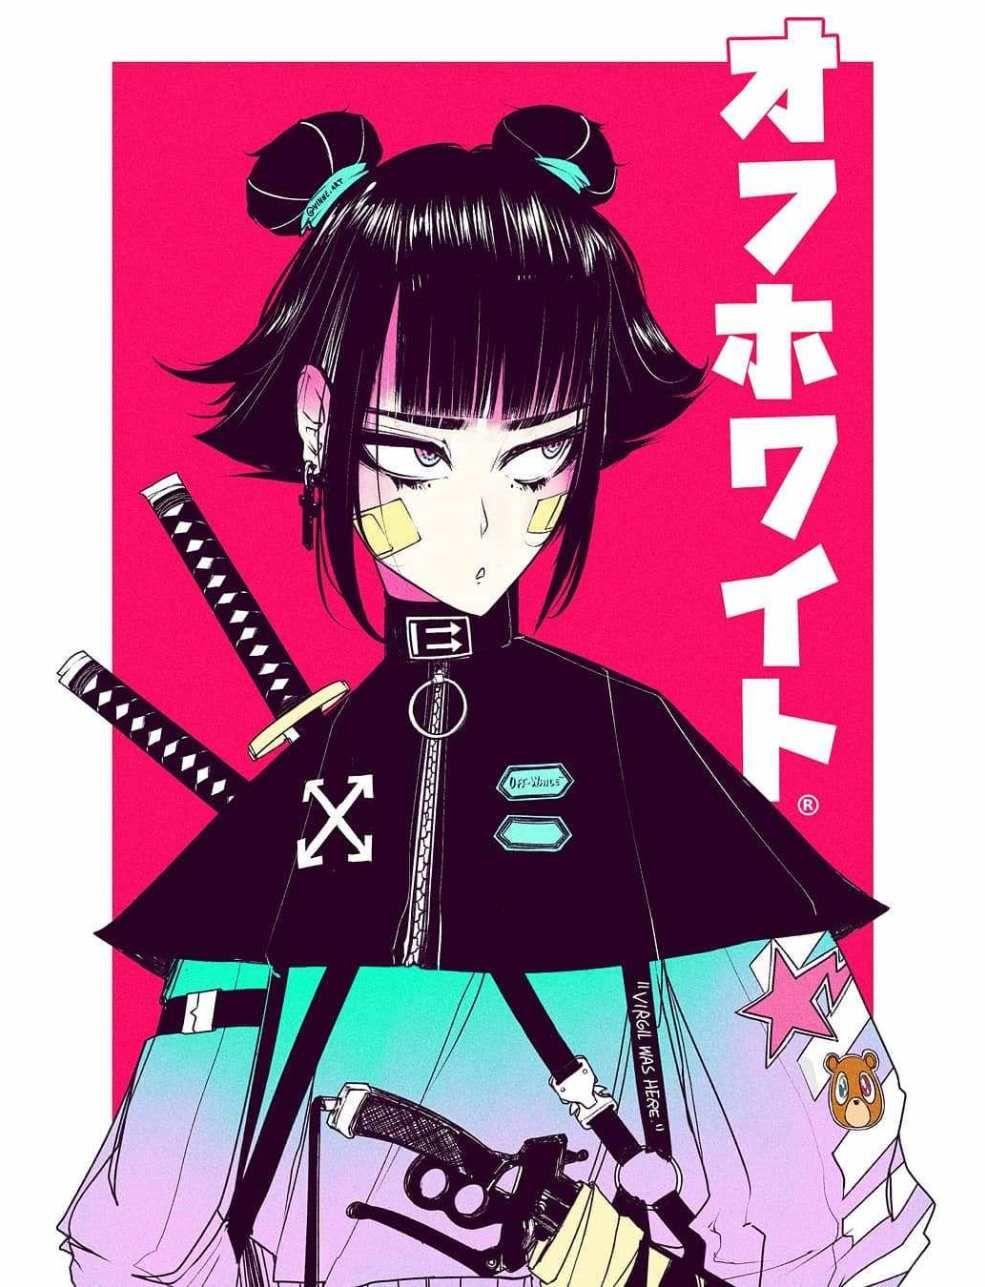 Cyberpunk Wonderland, a look at Vinne Anime, Samurai art